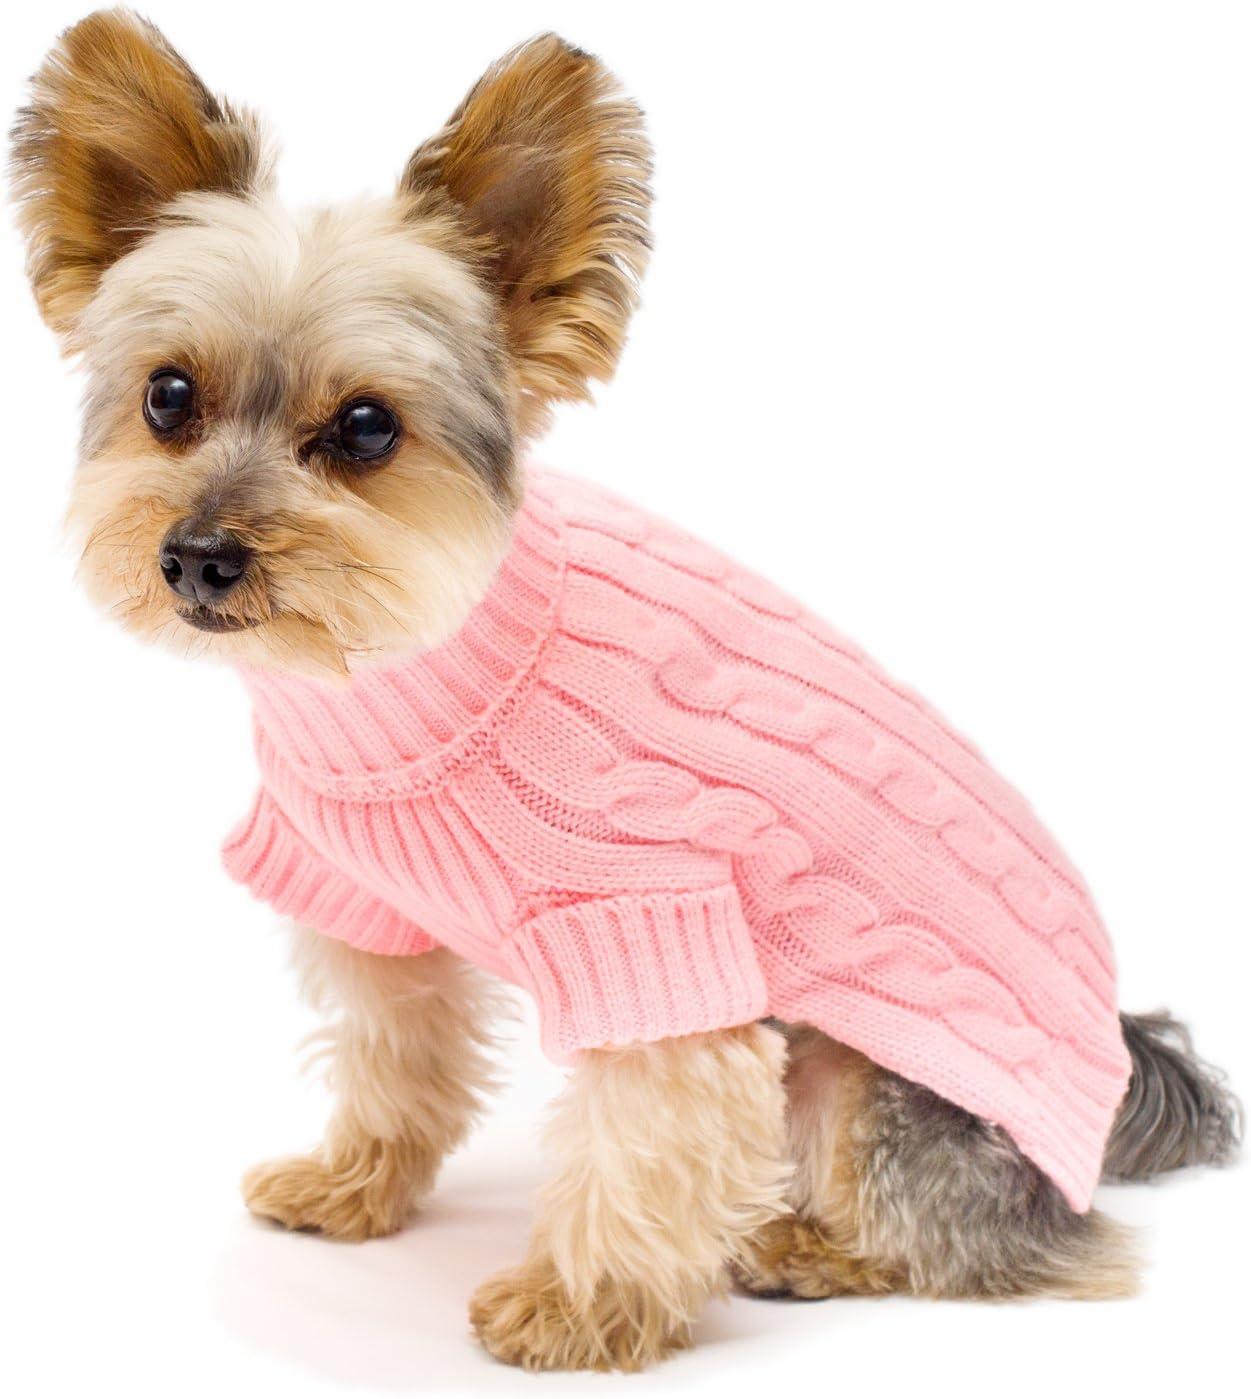 100% quality Charlotte Mall warranty Stinky G Turtleneck Sweater Dog